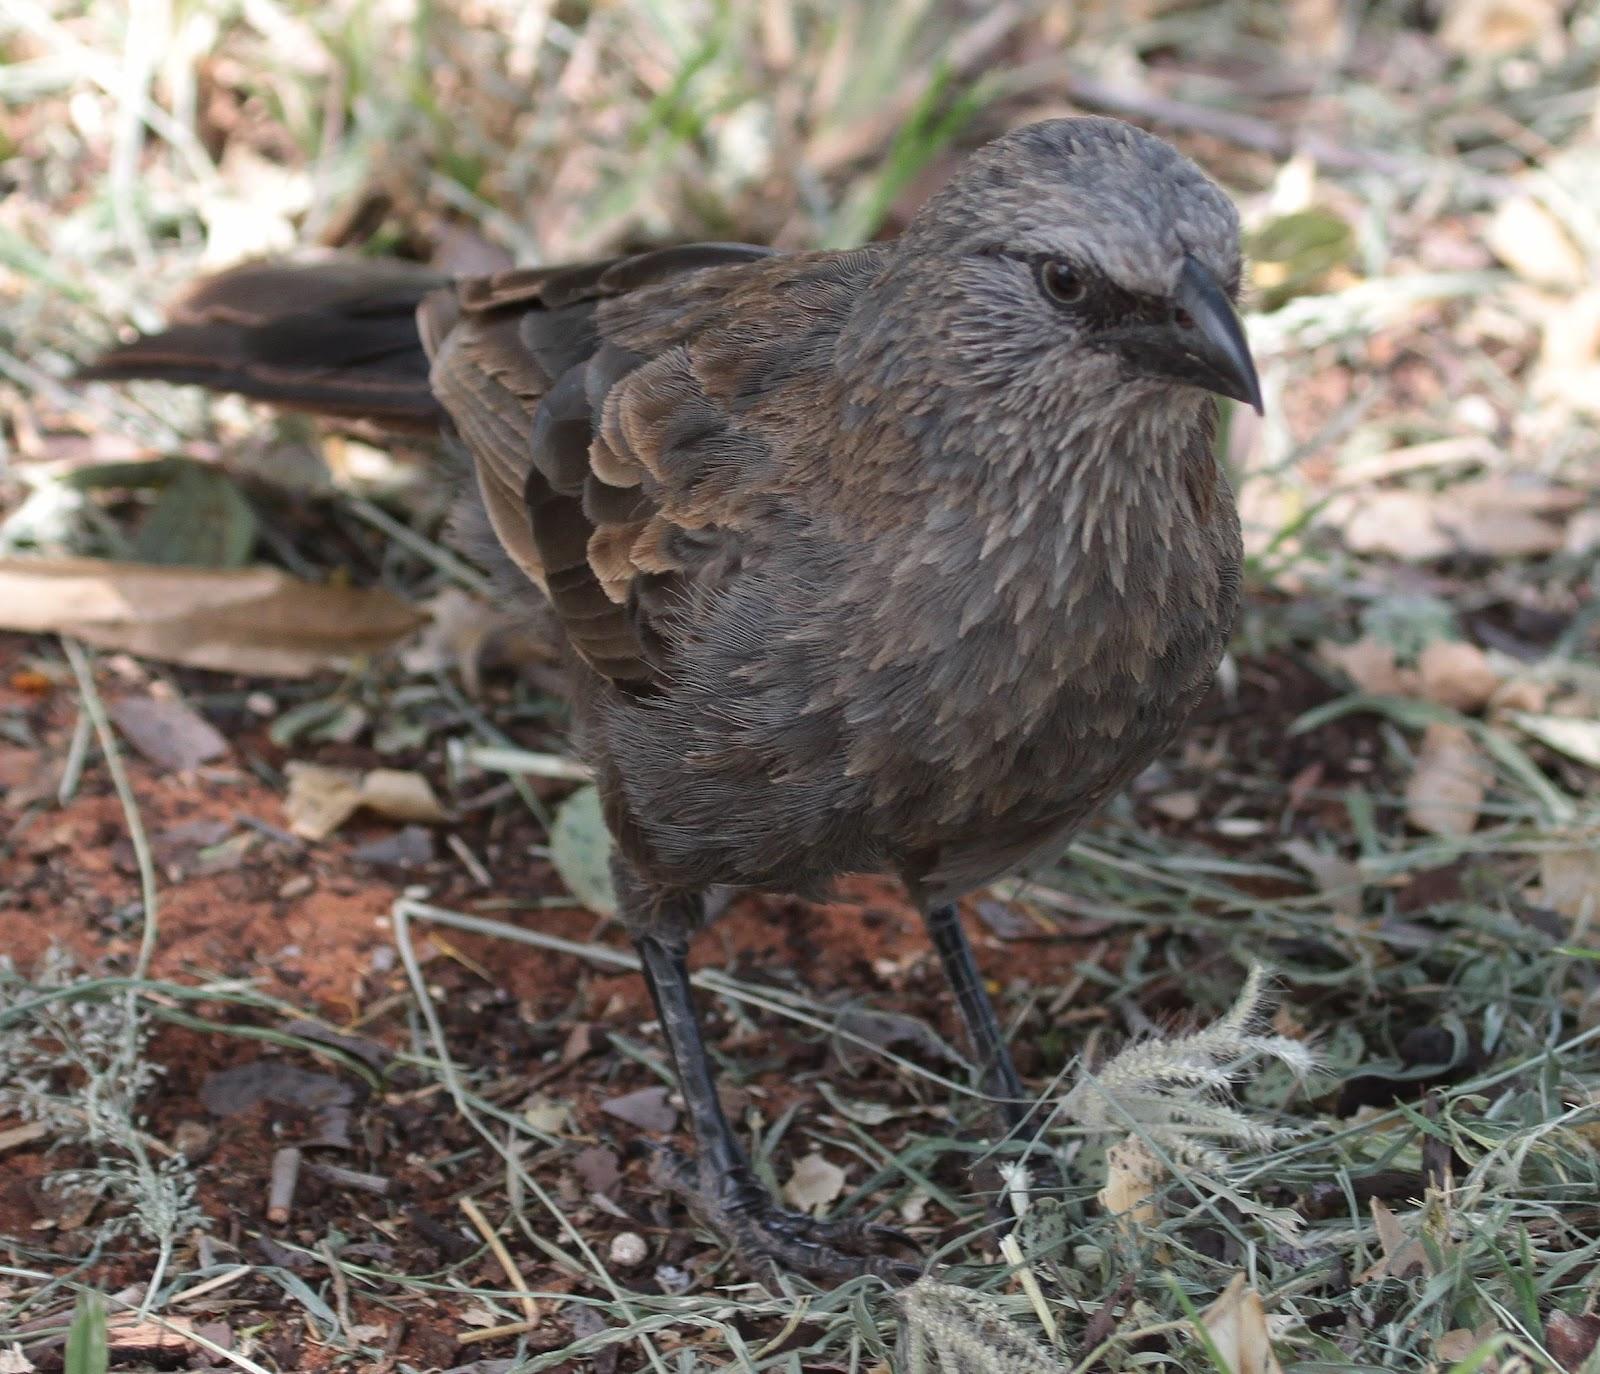 Richard Waring's Birds of Australia